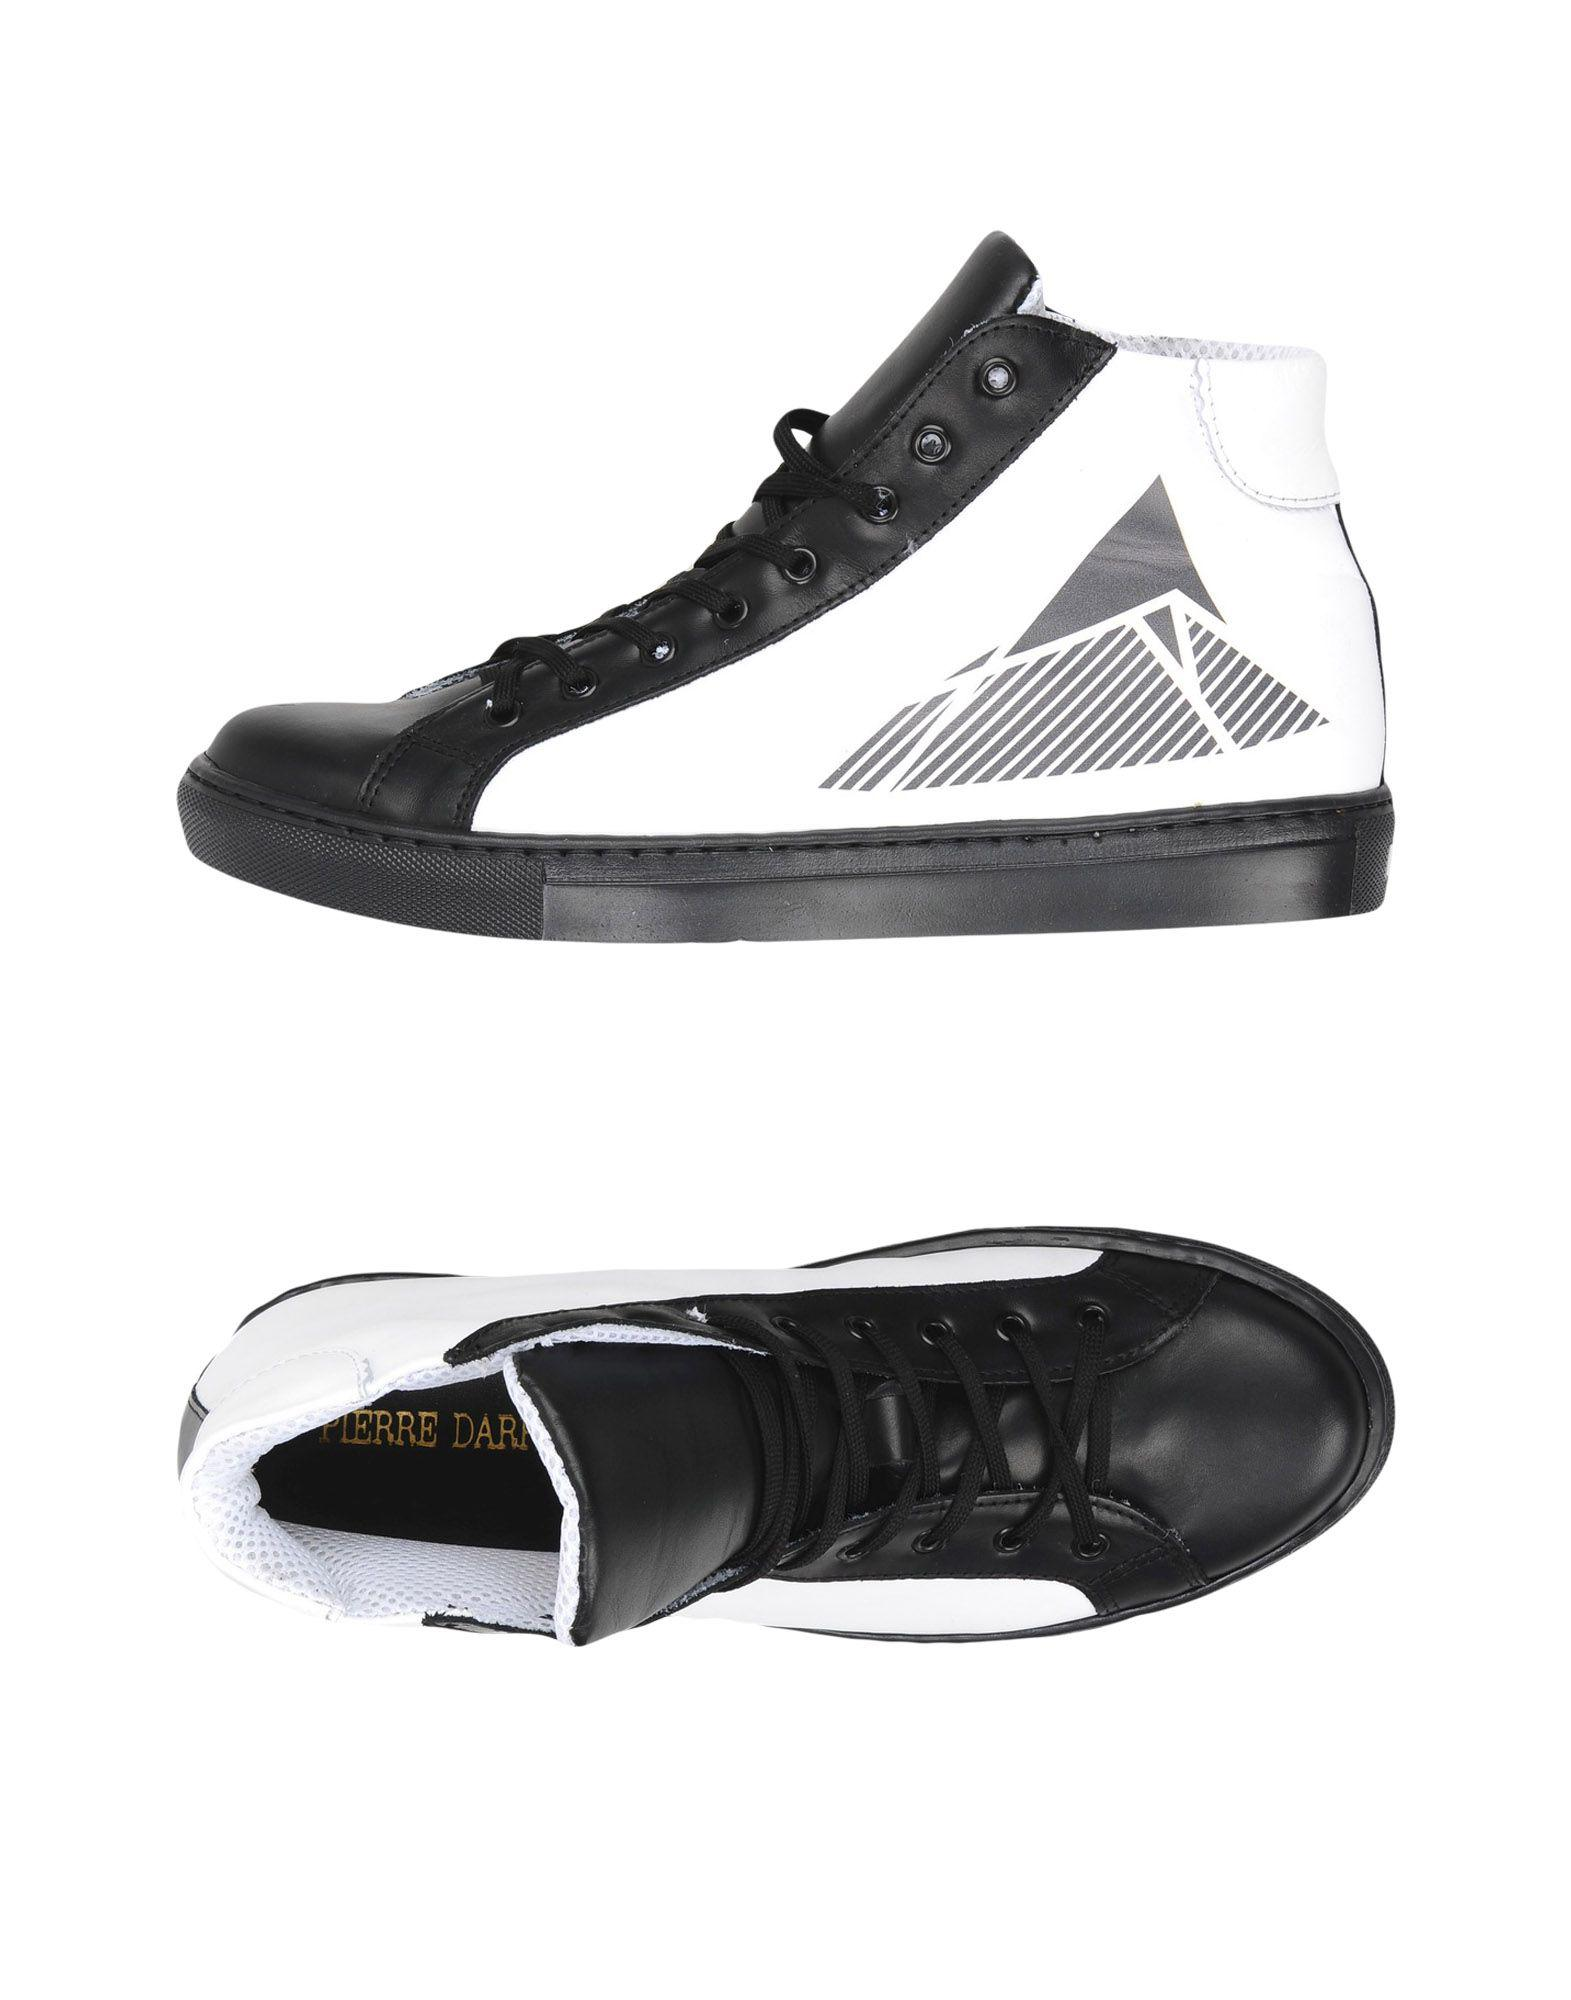 FOOTWEAR - High-tops & sneakers Pierre Darre 78ujZ